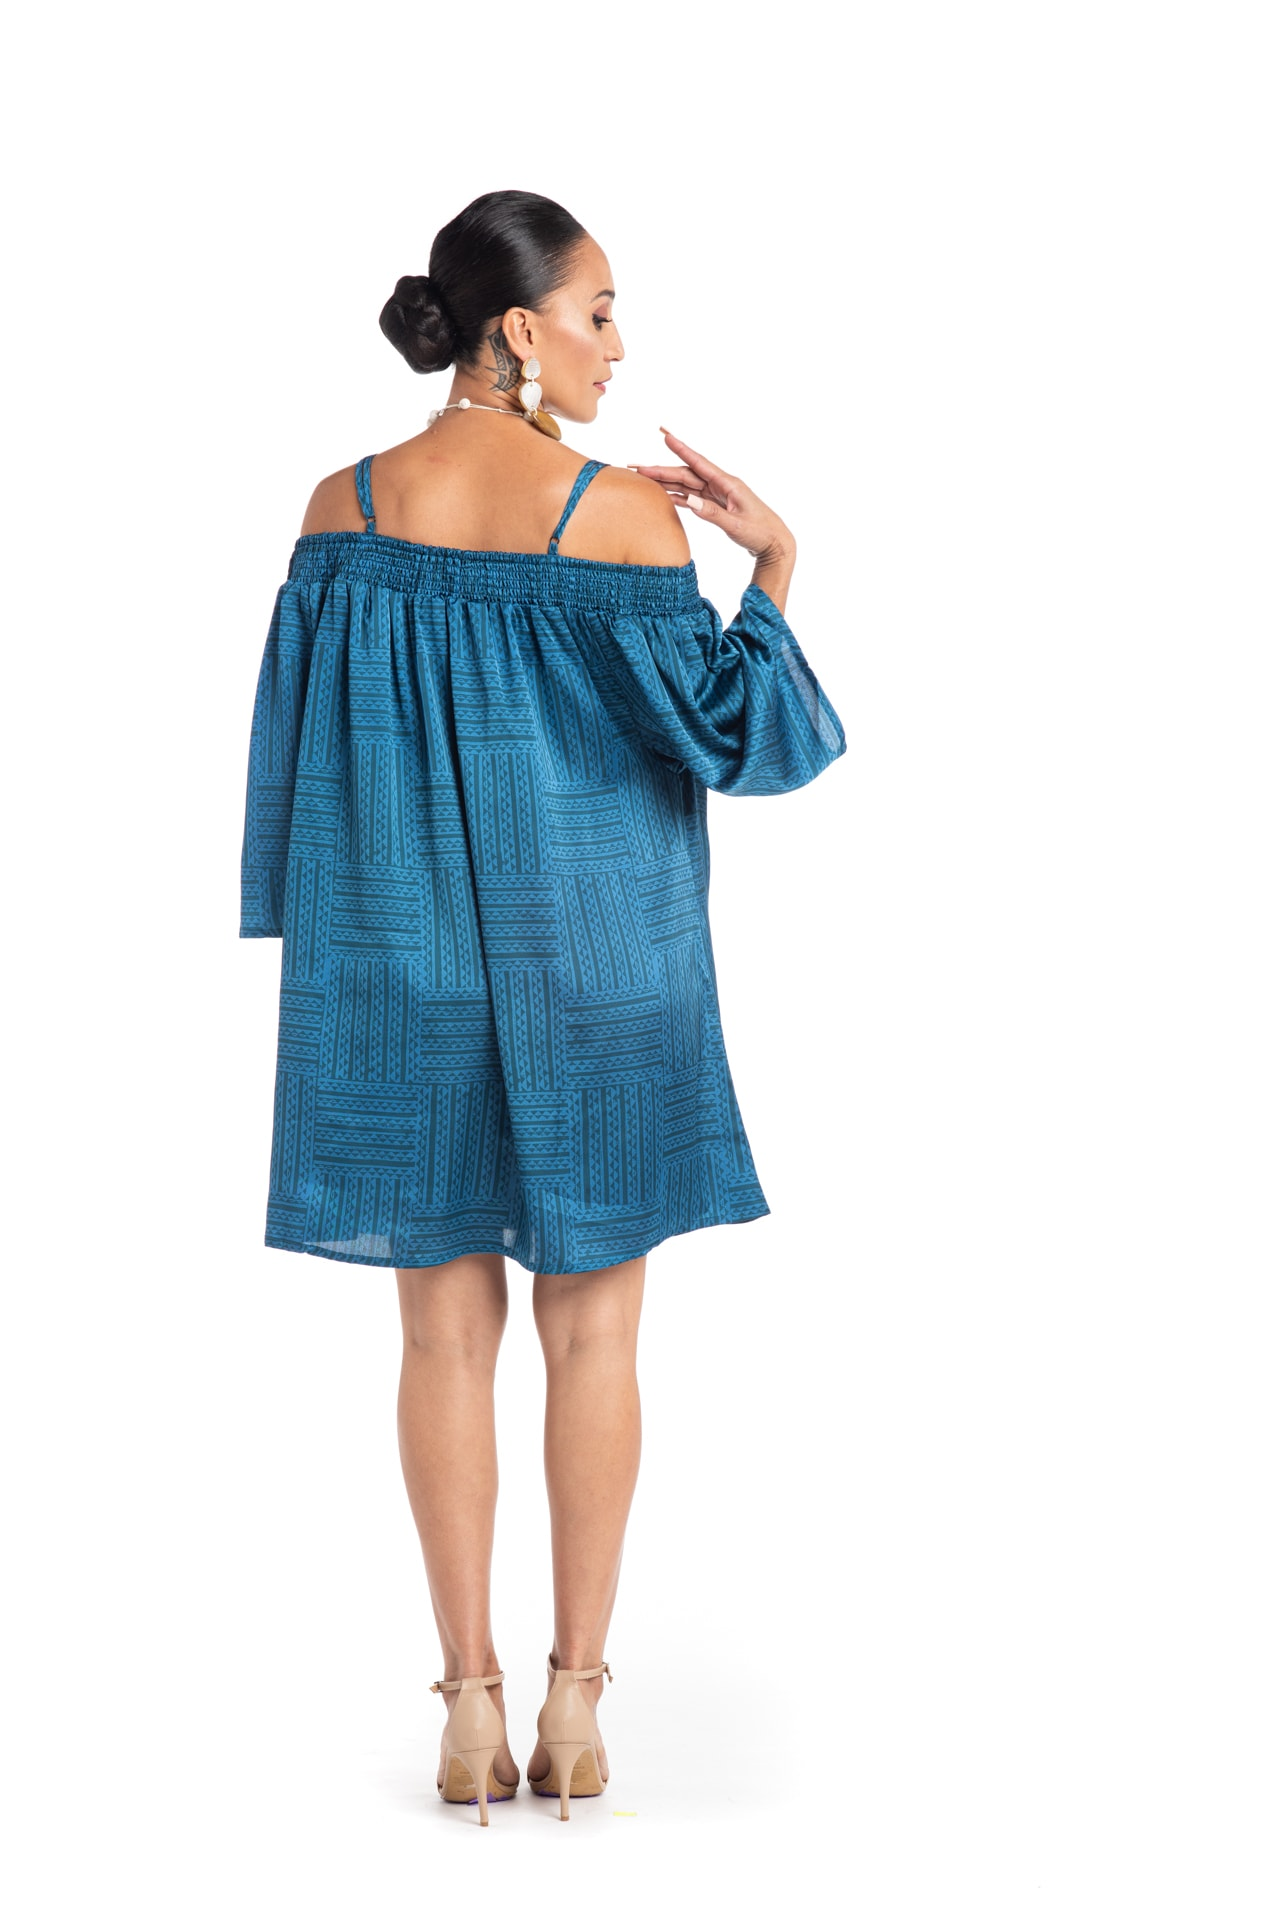 Model wearing Kauai Dress in Blue - Back View